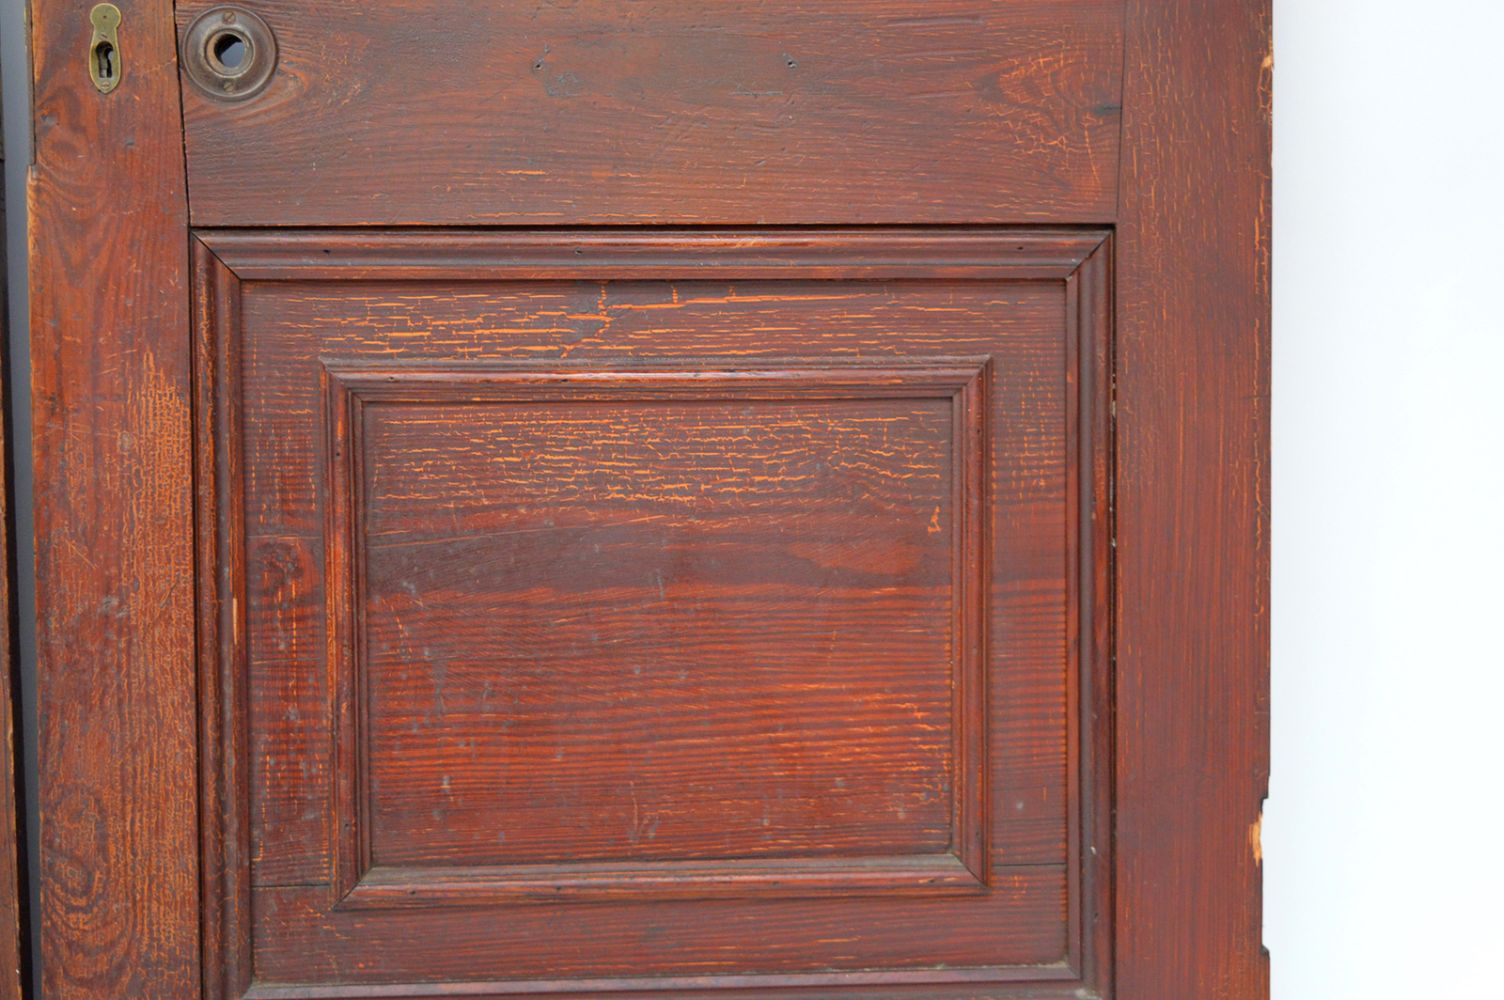 19TH-CENTURY SCUMBEL PITCH PINE SALOON DOORS - Image 3 of 3